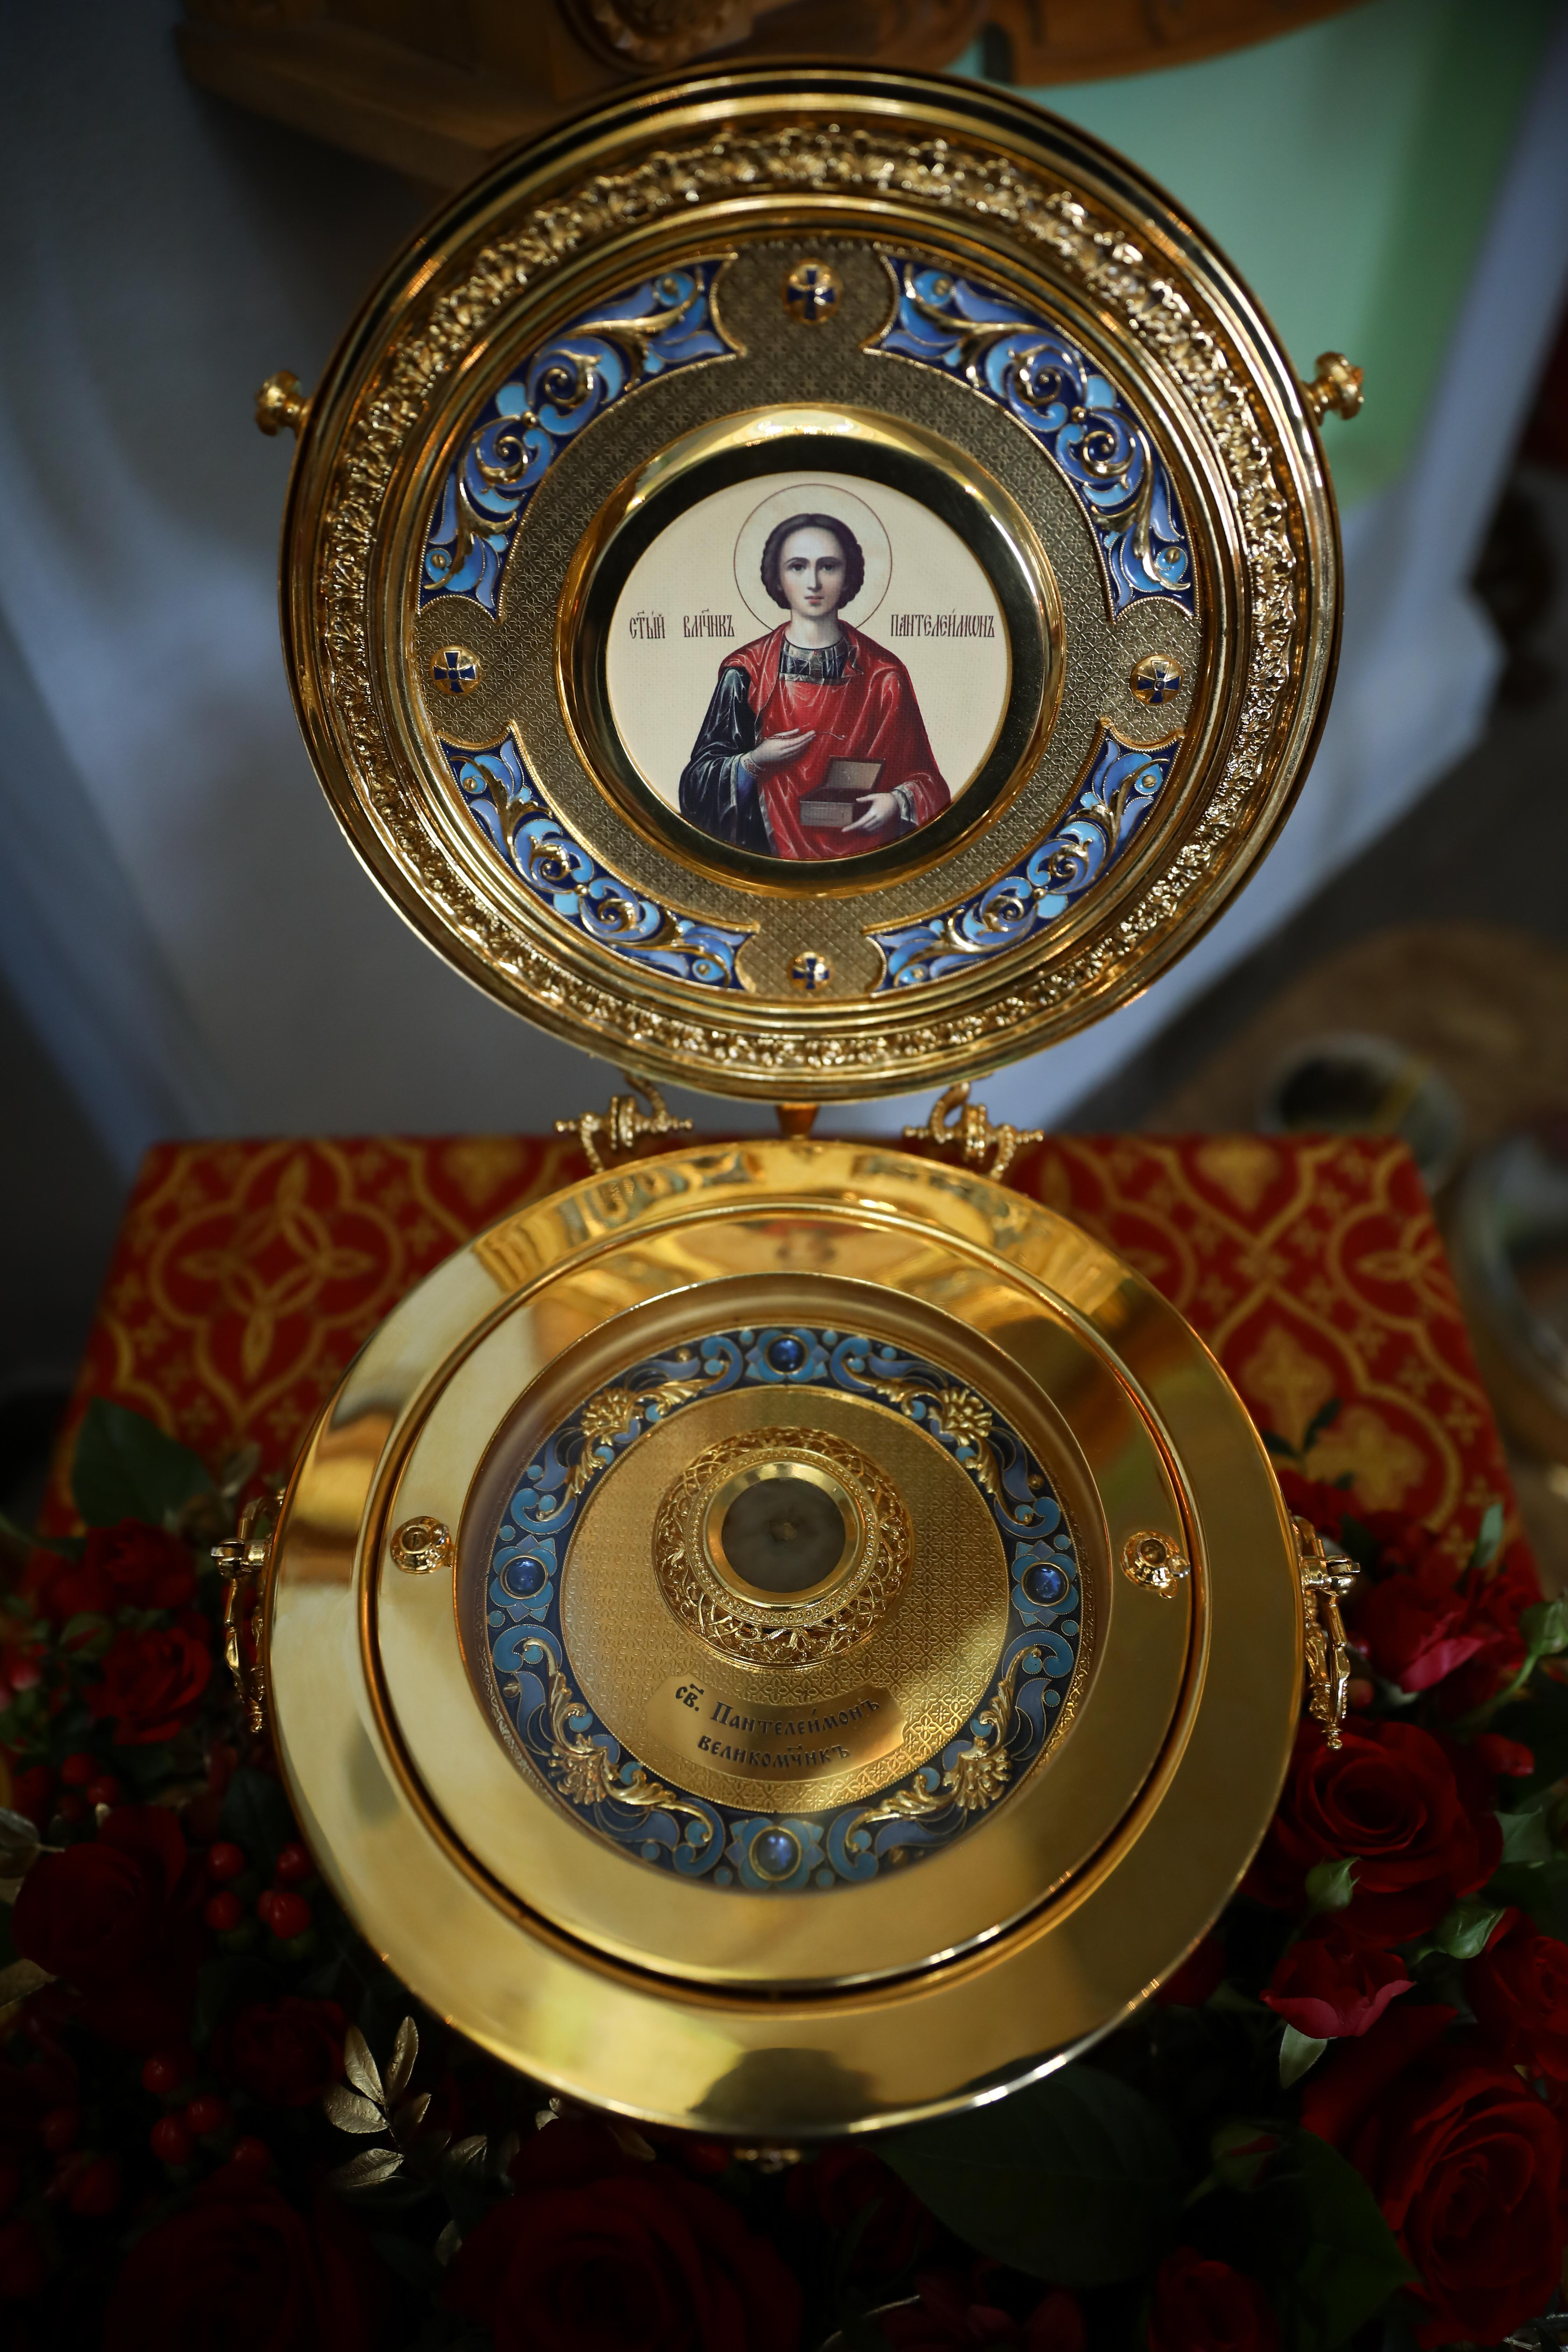 http://monuspen.ru/photoreports/6fe34d0b1744123e0a9091cd842914bc.jpg